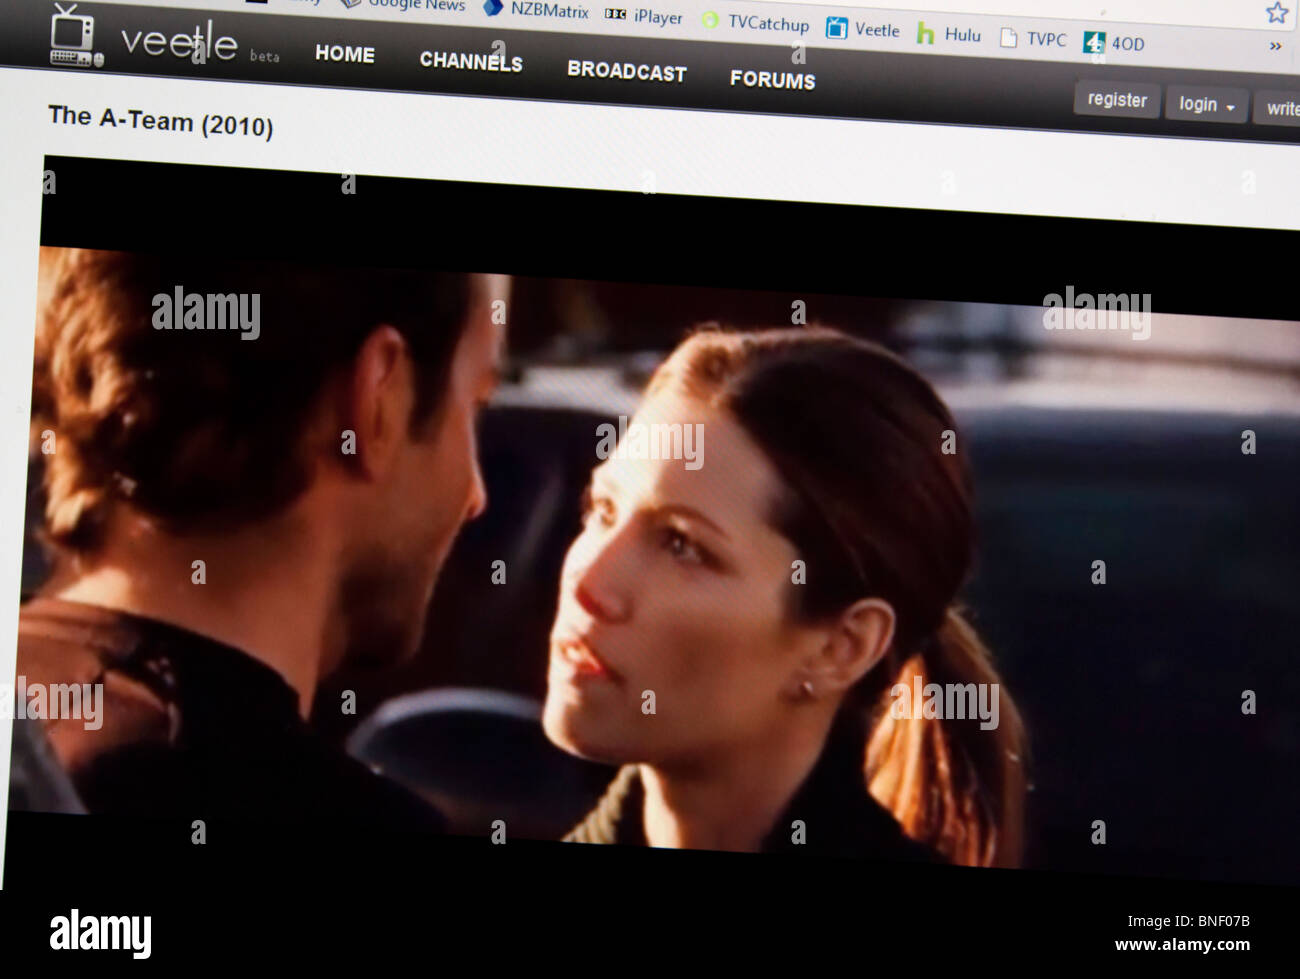 Veetle Internet TV broadcast website Stock Photo: 30447631 - Alamy